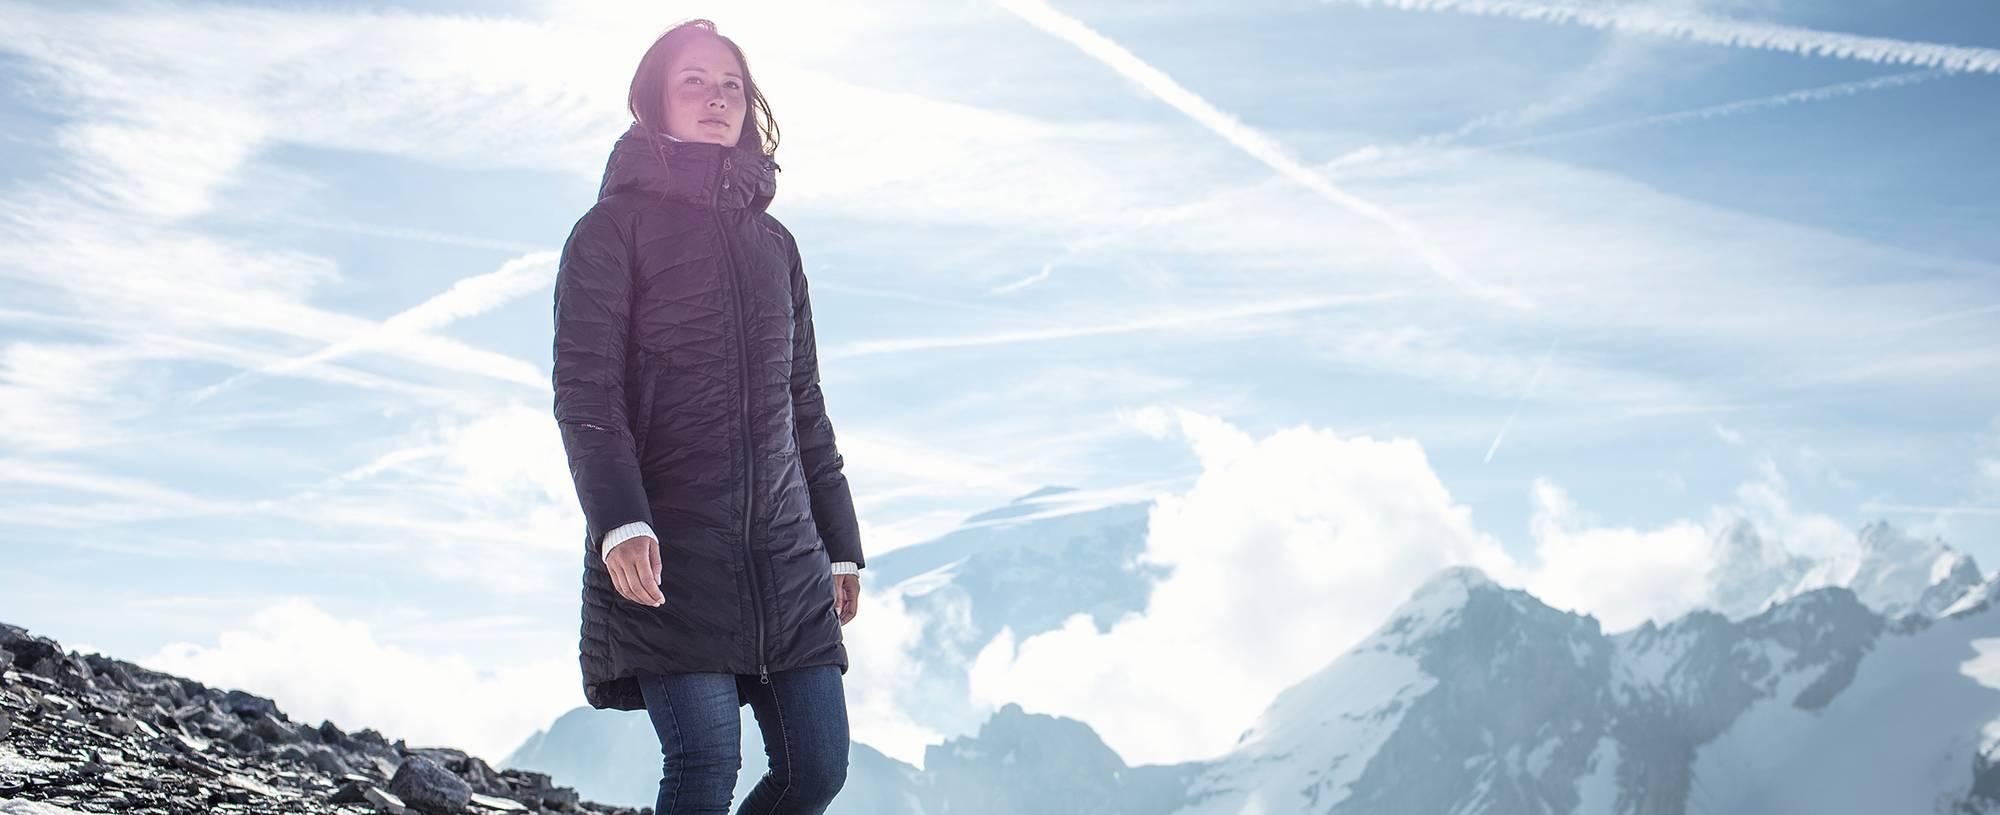 Upptäck áhkká outdoor : varma jackor & skor : vinter 2017